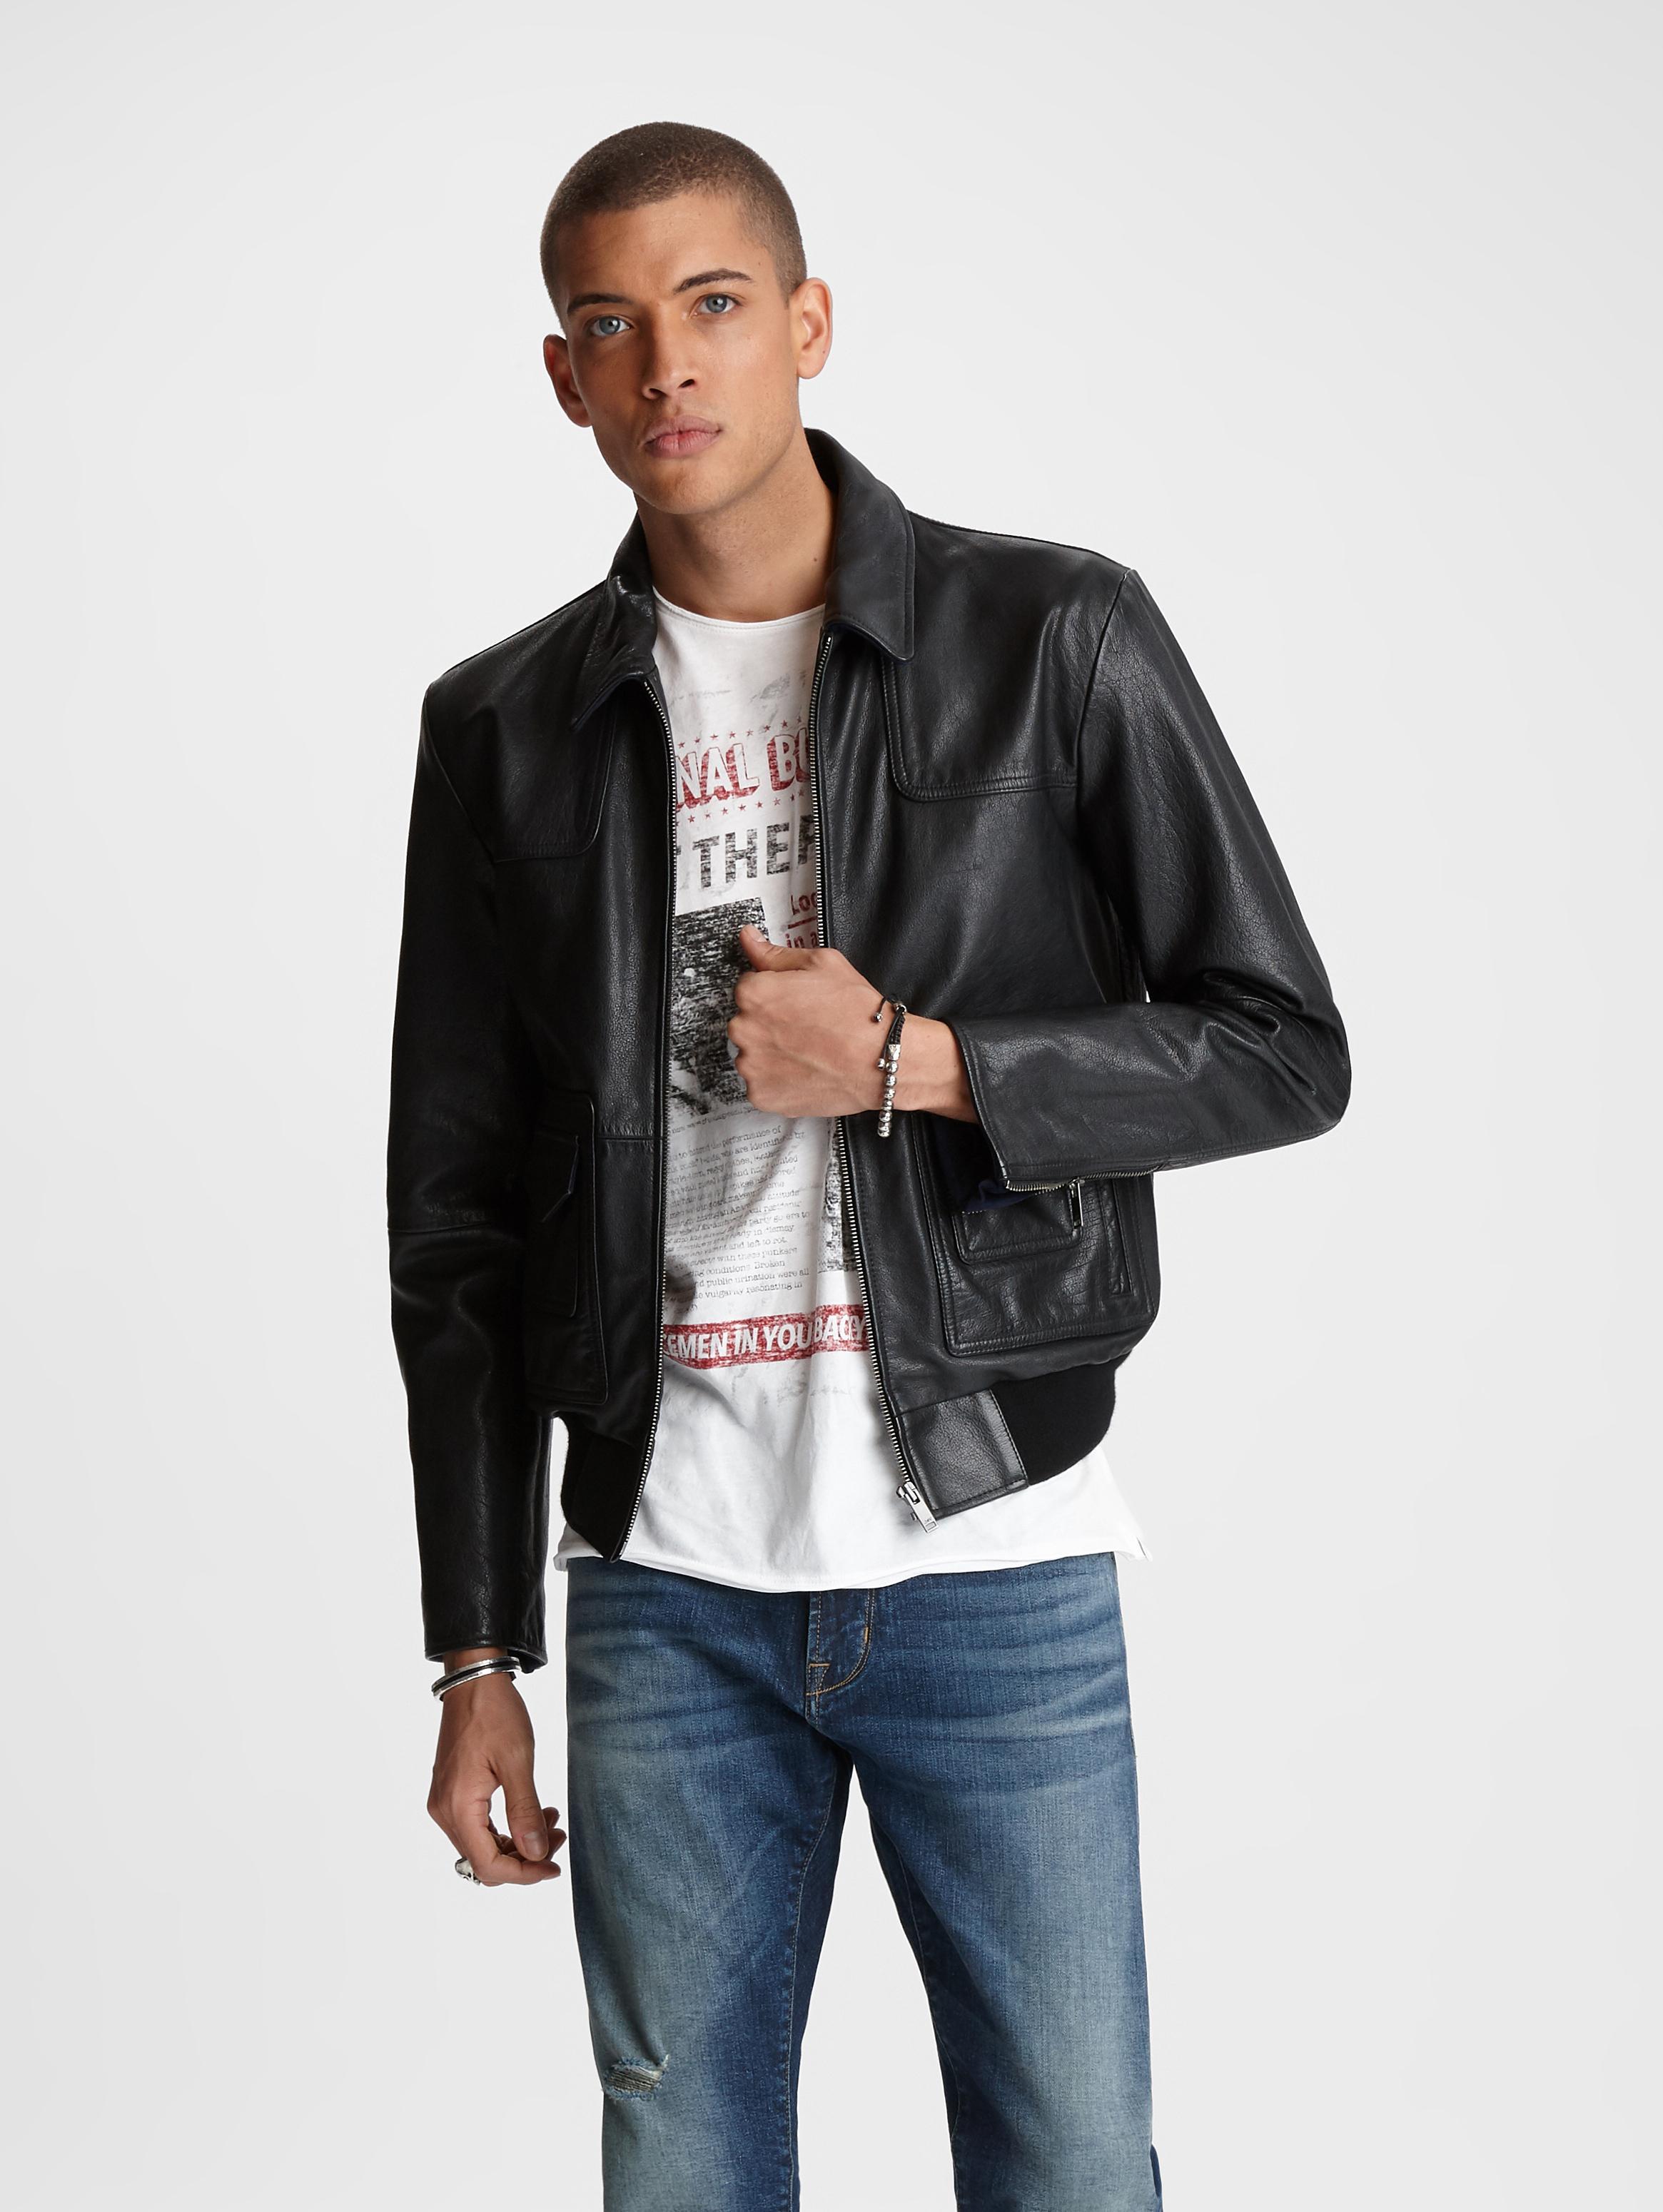 John Varvatos Reese Leather Jacket Black